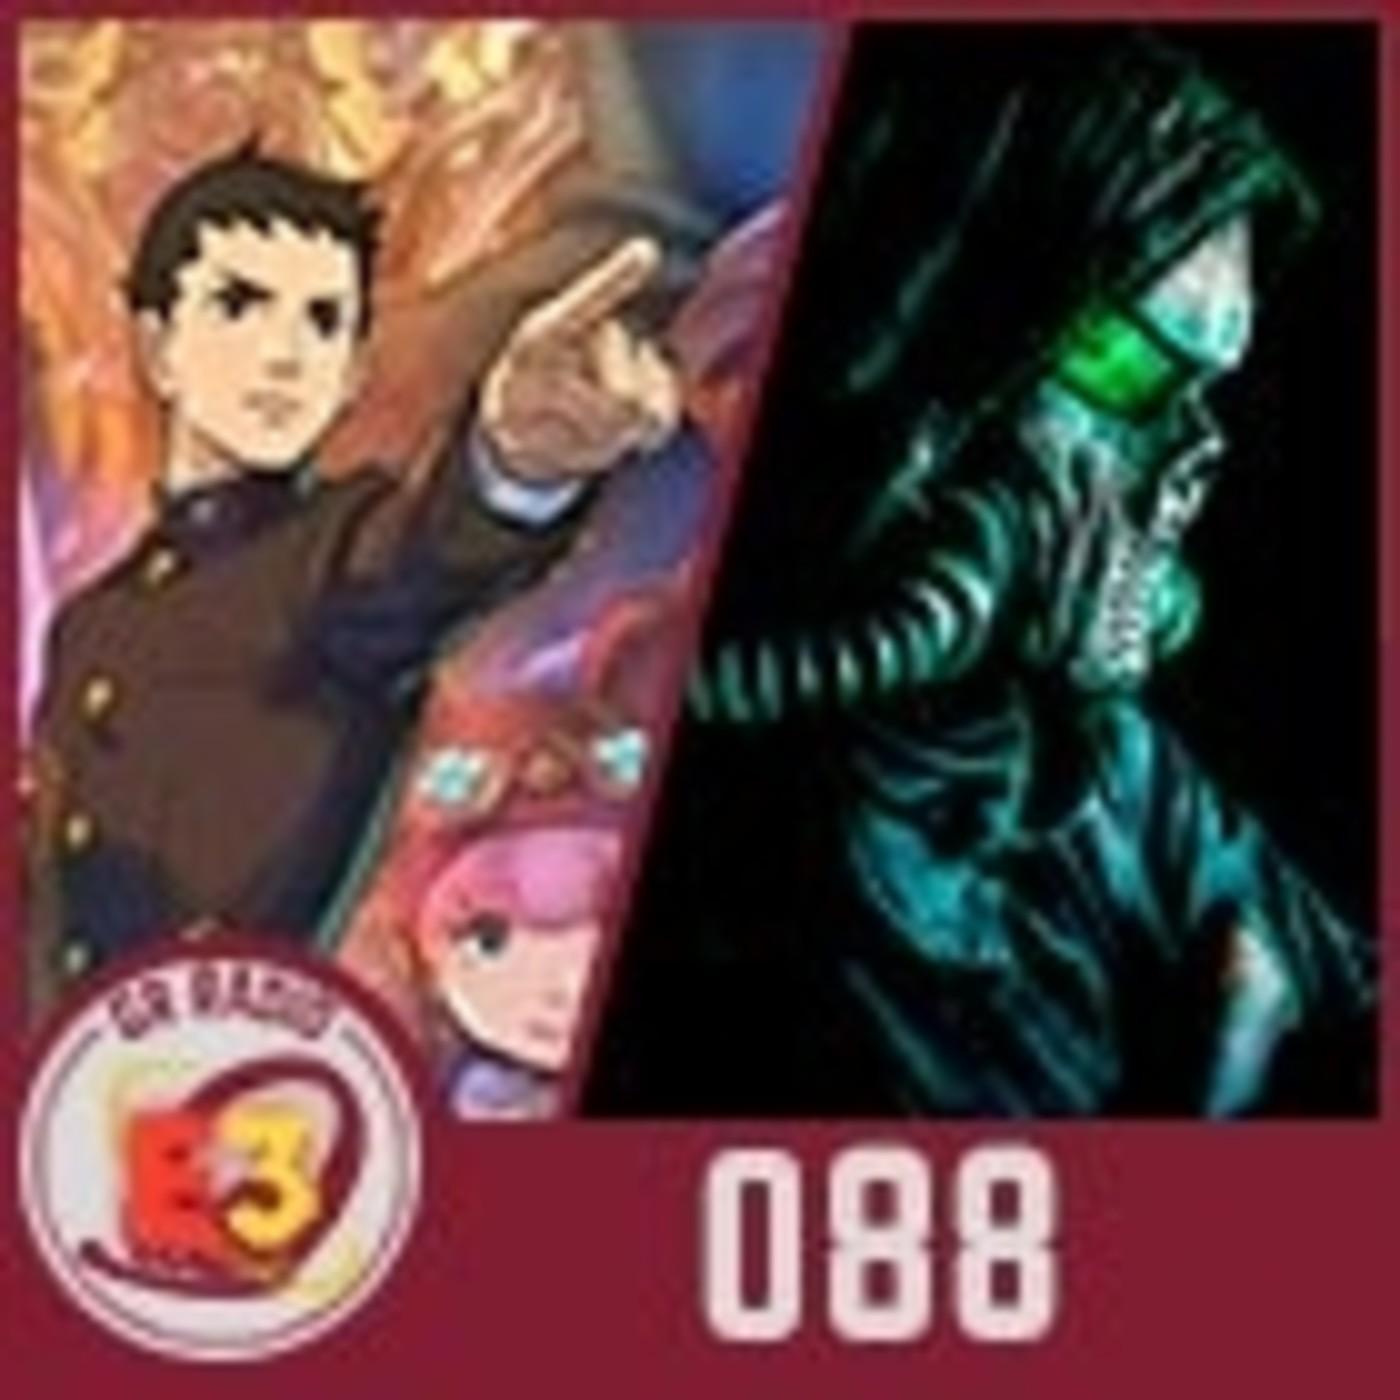 #E32021 GR (088) CAPCOM decepciona | PC GAMING SHOW | FUTURE GAMES SHOW | INDIE SHOWCASE | LIMITED RUN GAMES